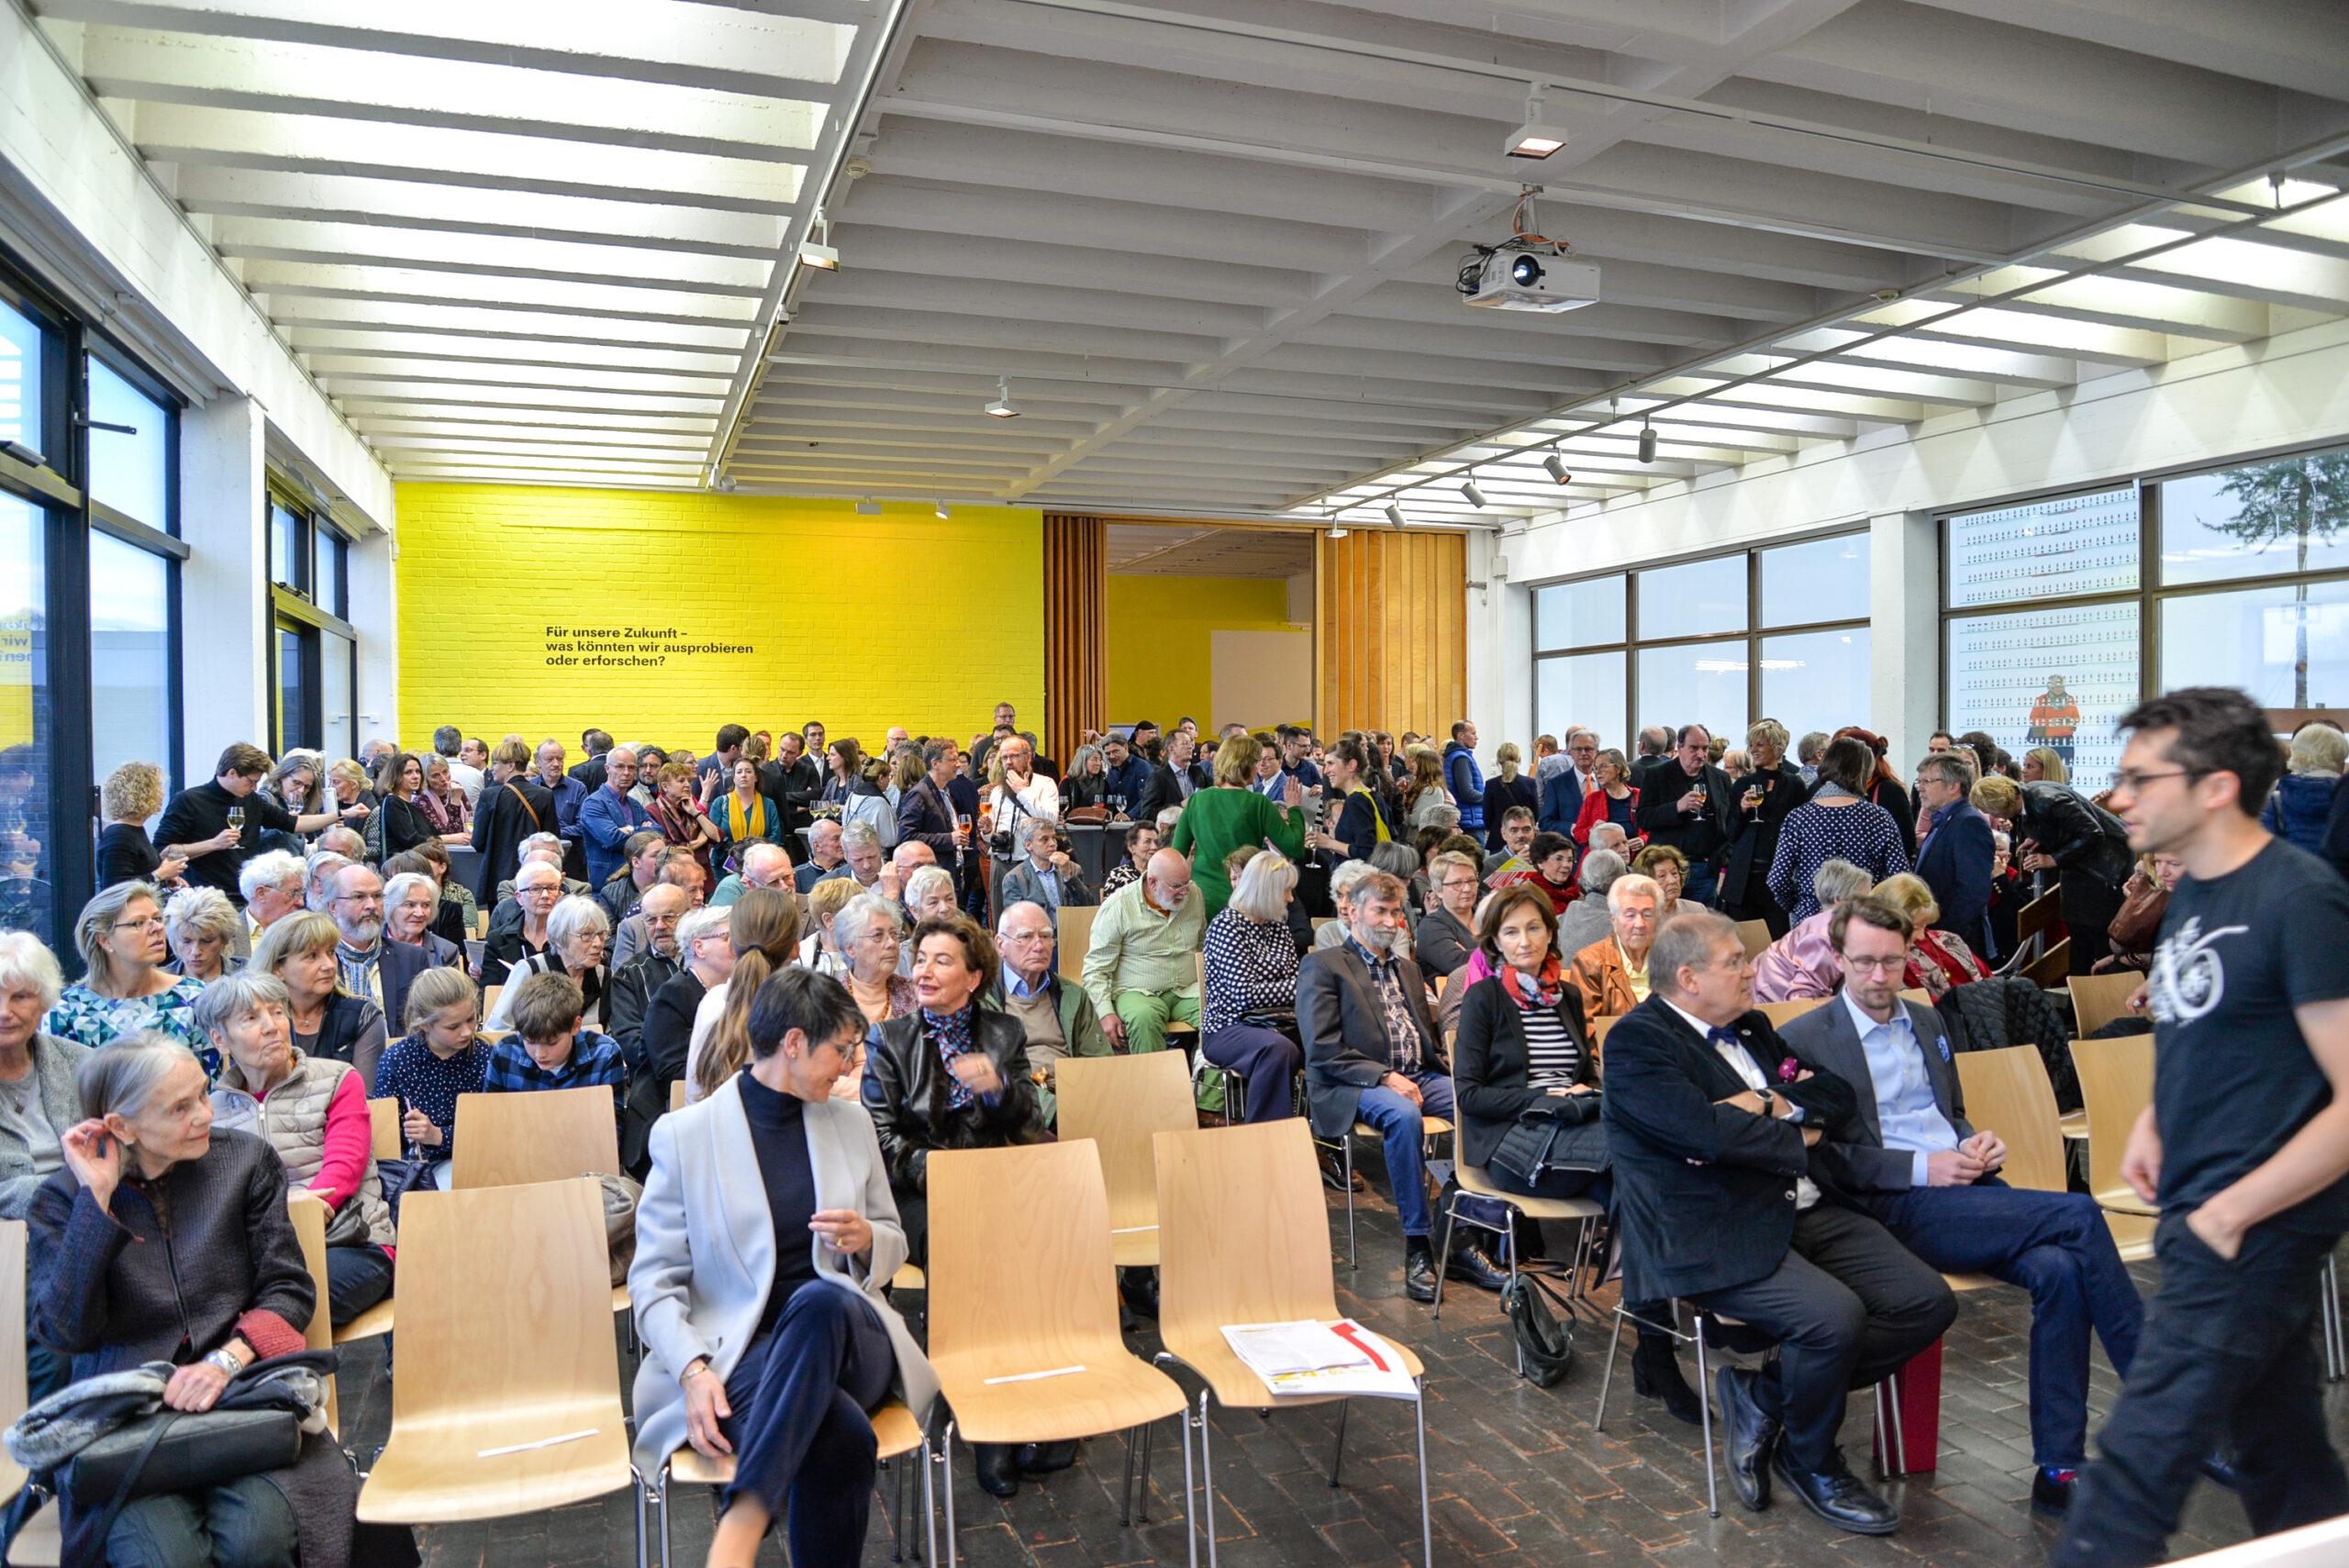 Exhibition opening: Experiment Zukunft, Kunsthalle Rostock, 2019 Photograph: Fritz Beise/Kunsthalle Rostock